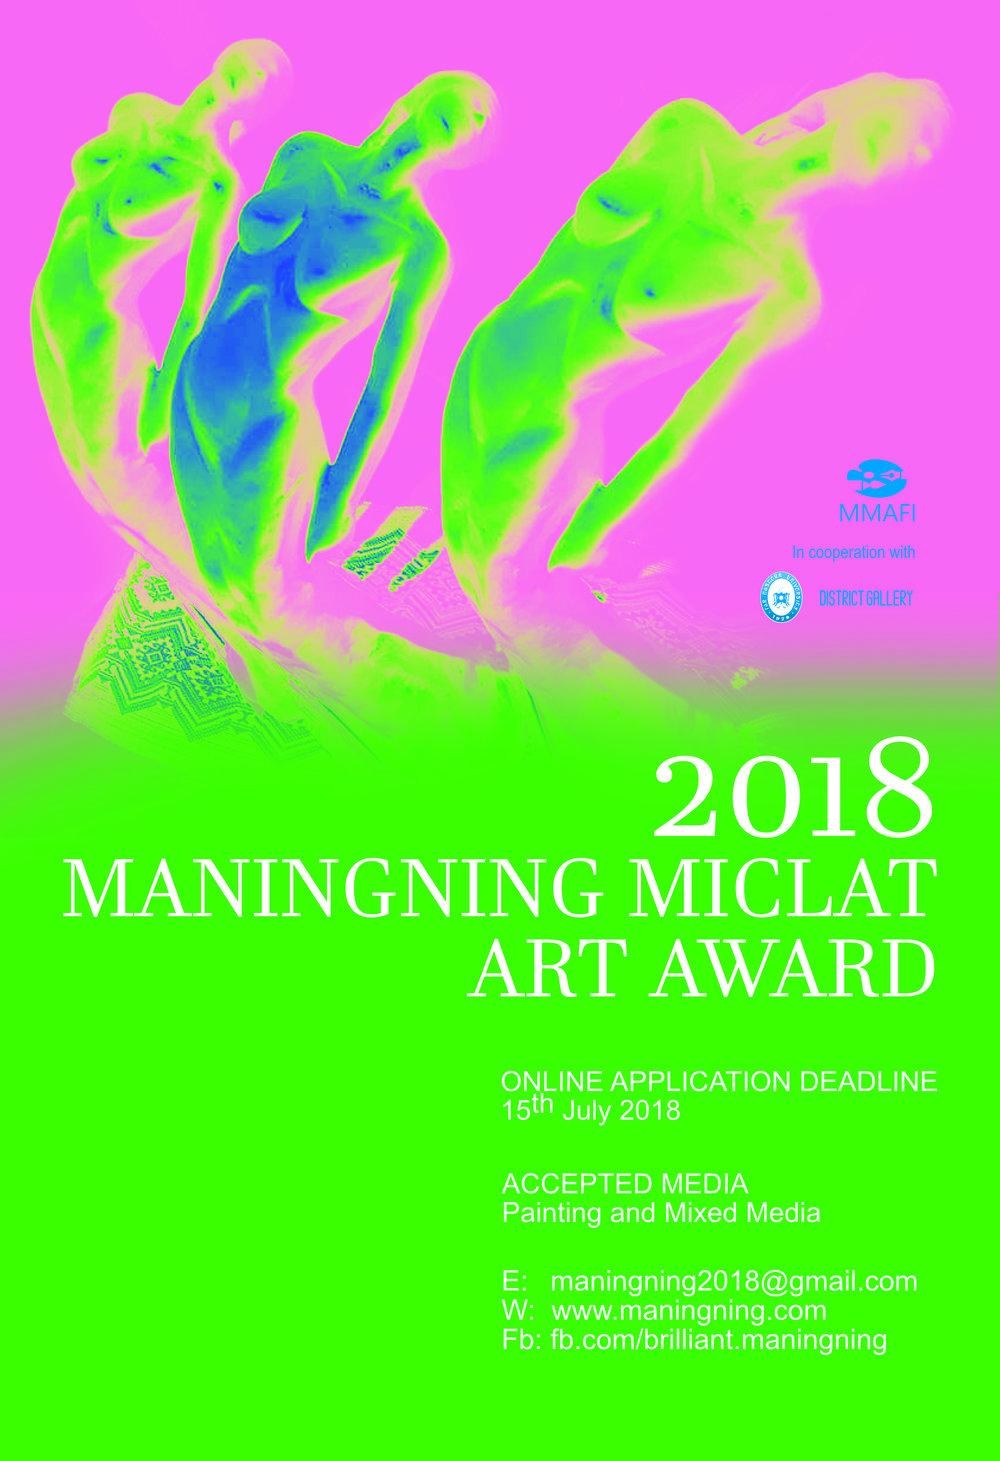 Maningning Miclat Art Award Poster_ final.jpg